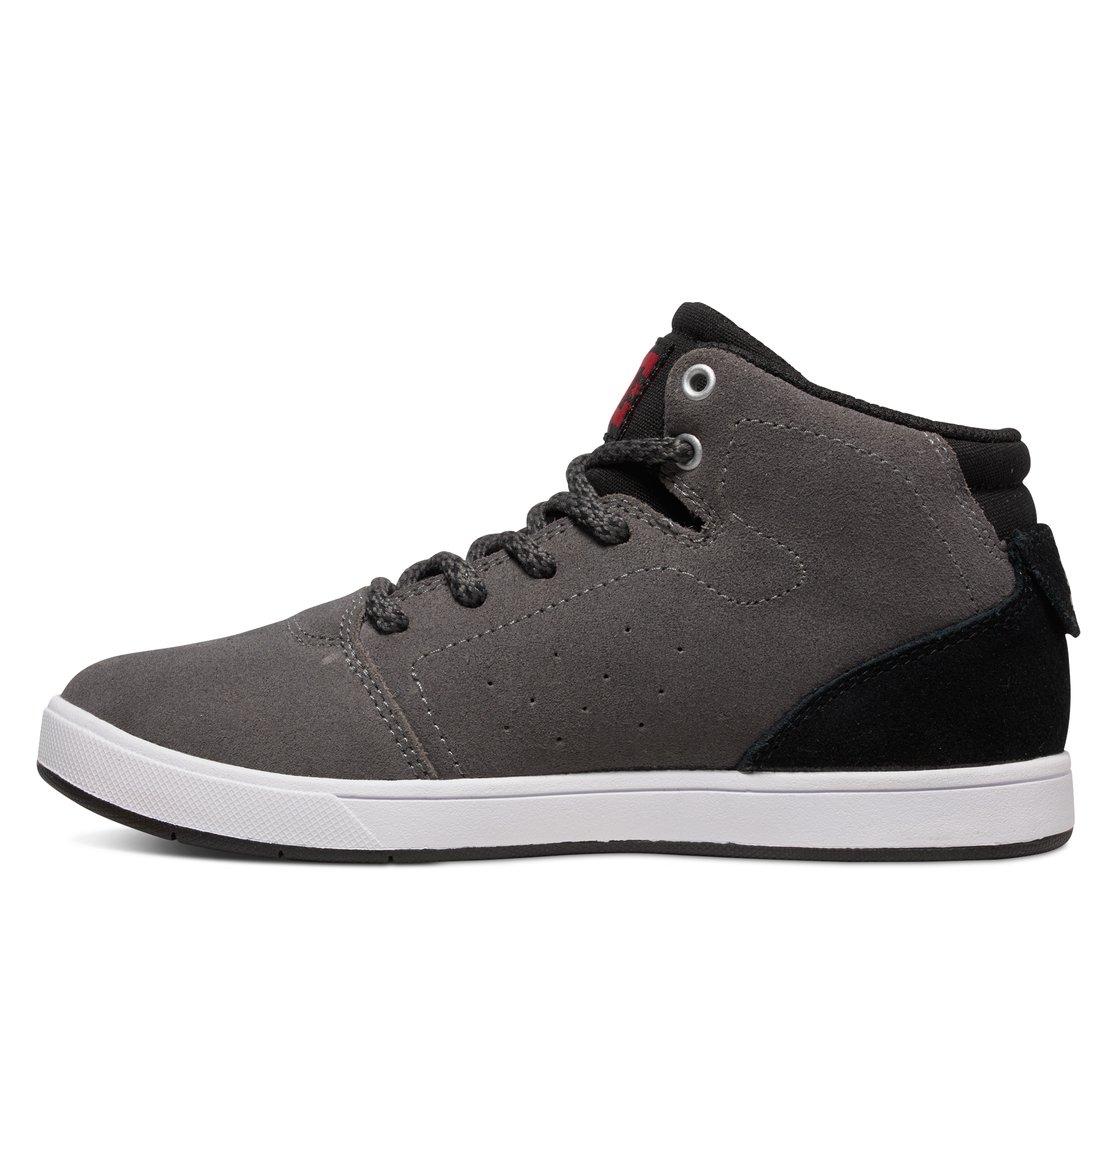 crisis chaussure montante 3613372103520 dc shoes. Black Bedroom Furniture Sets. Home Design Ideas